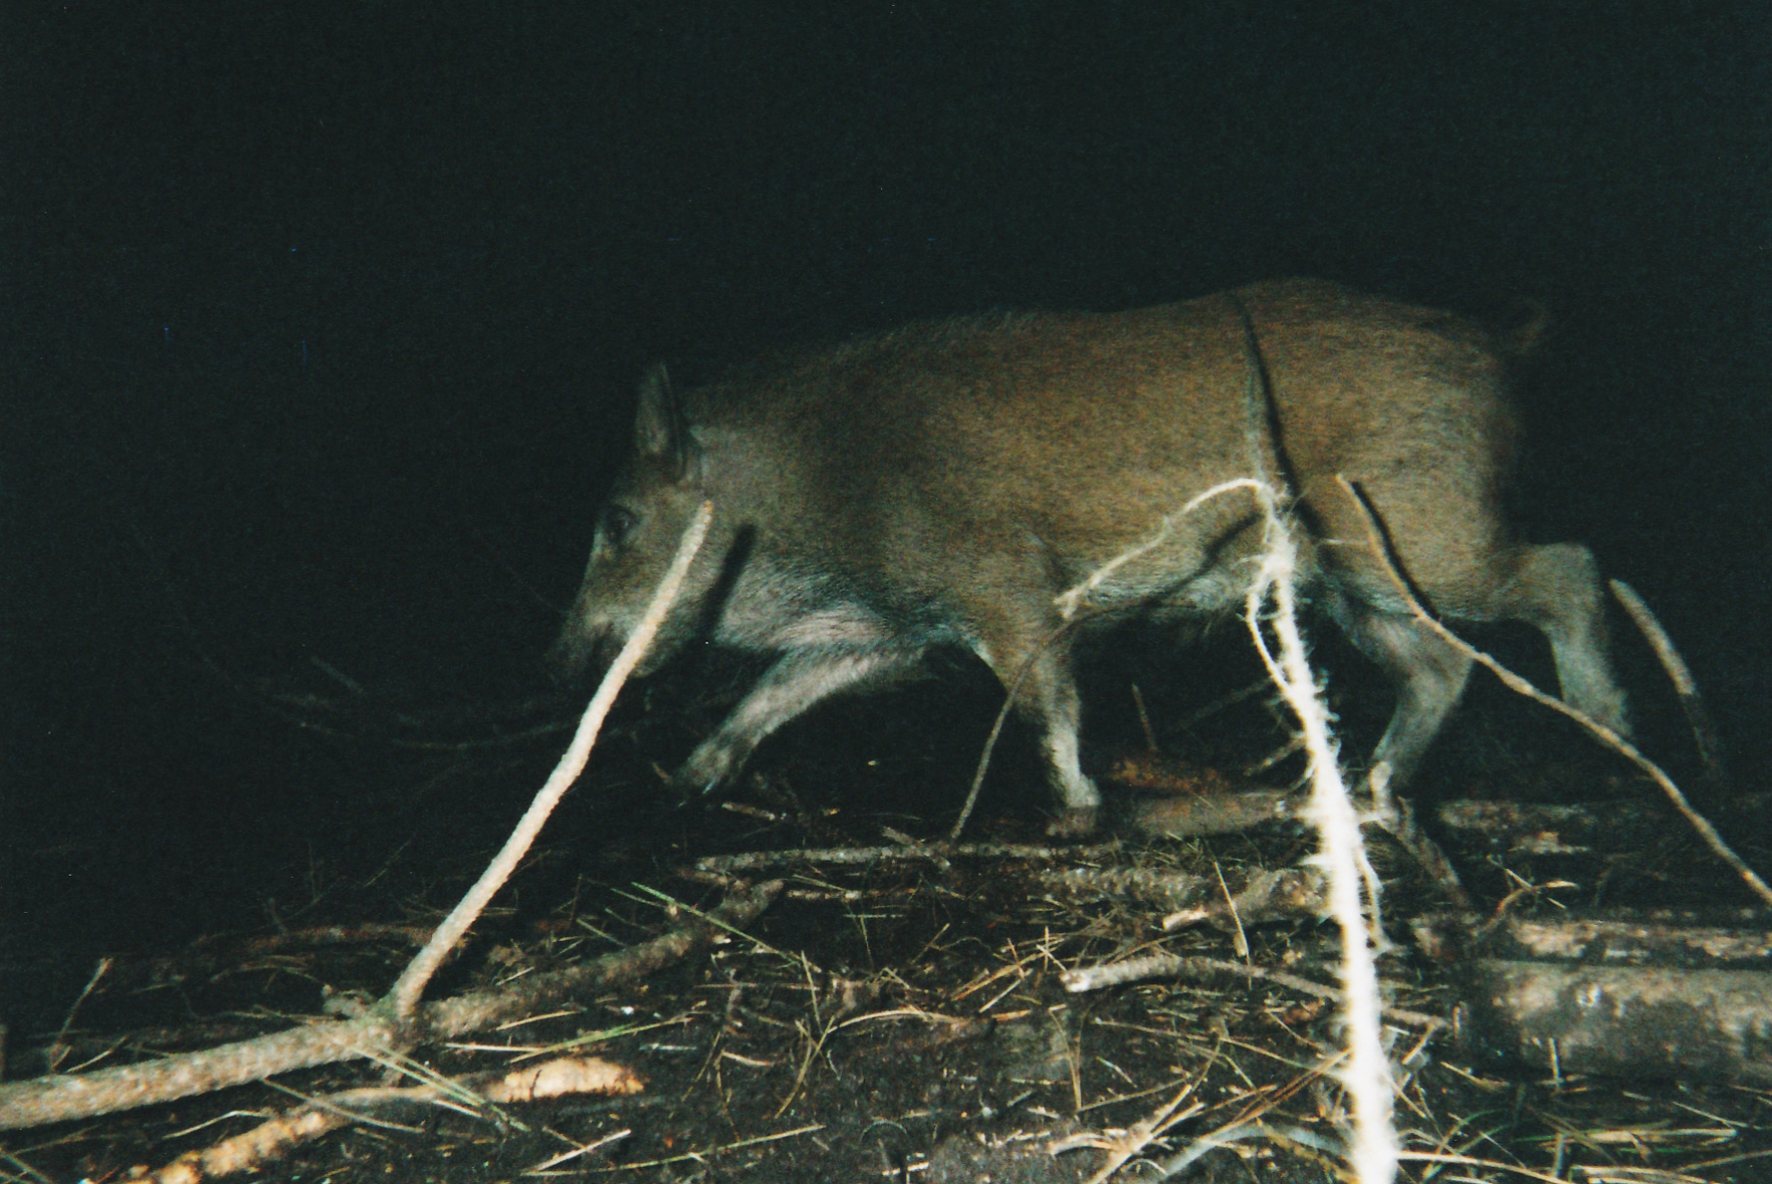 Wild Boar Photos 04.jpg